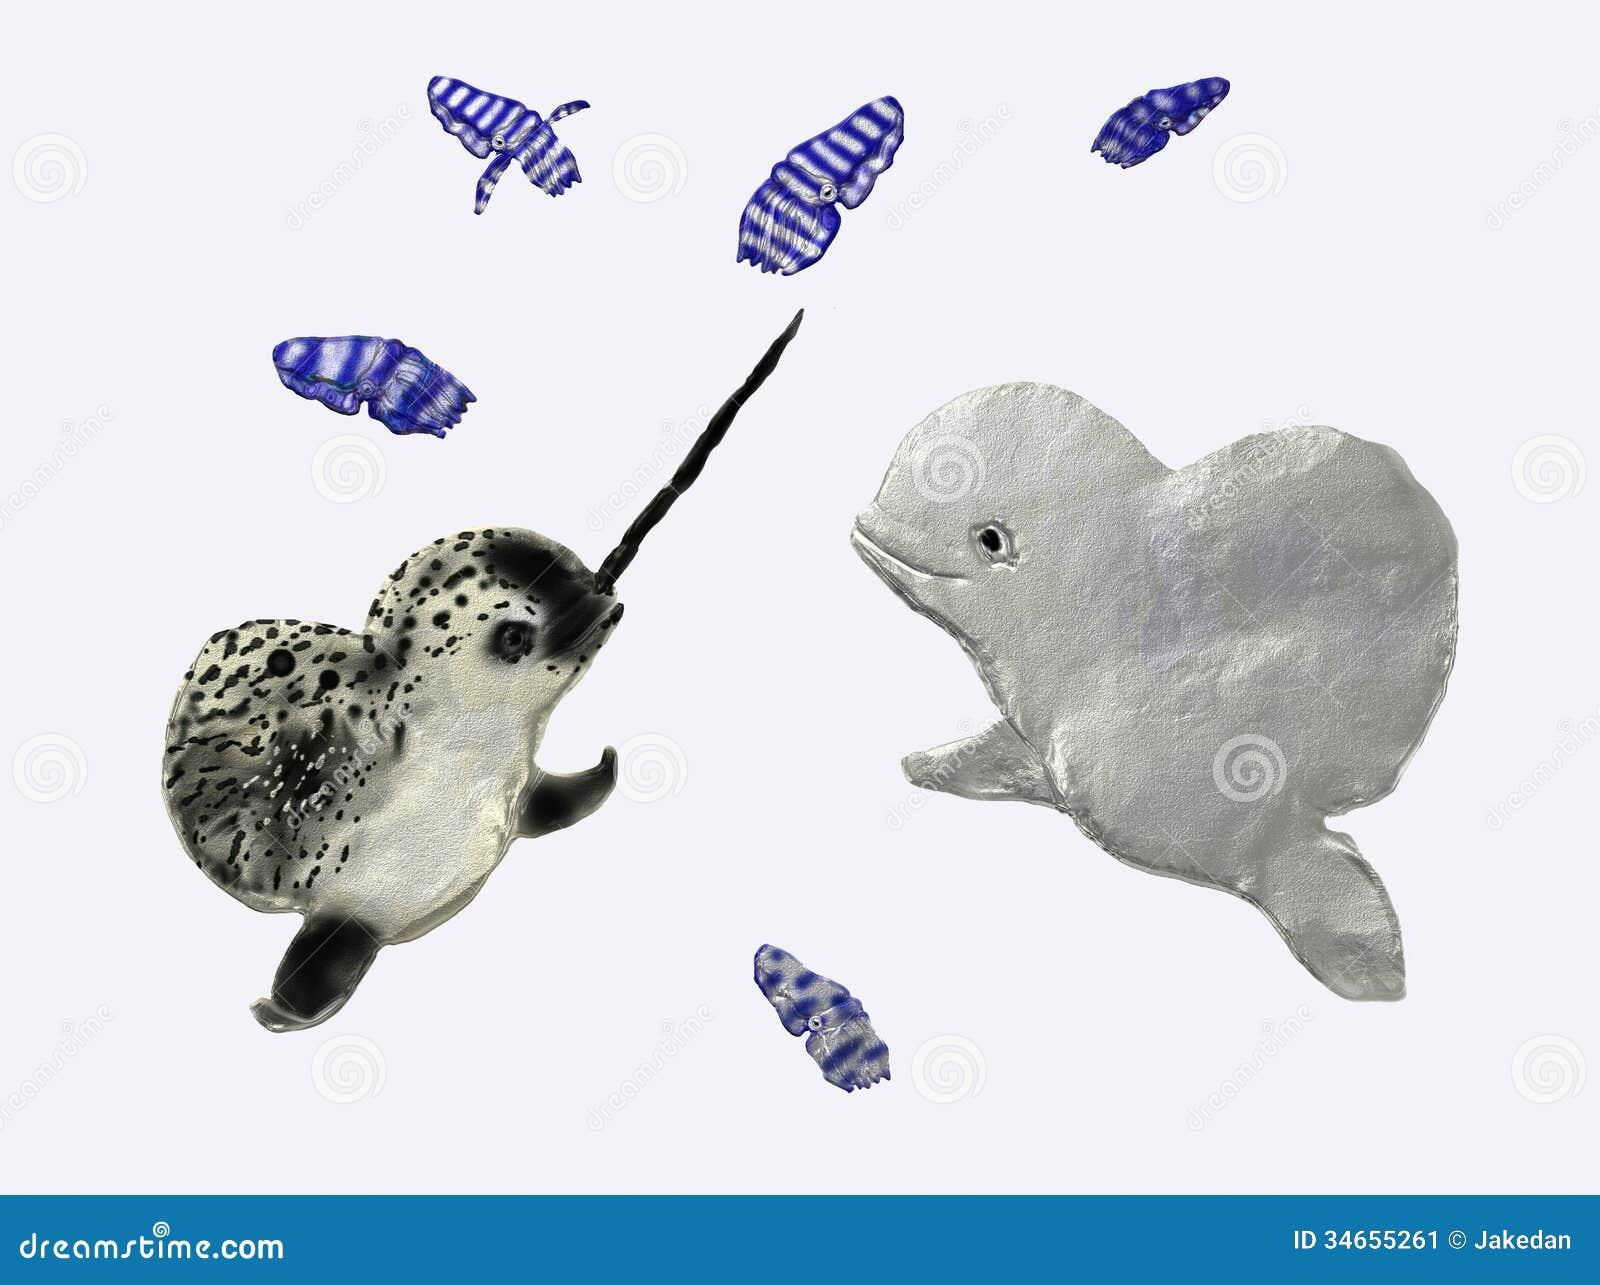 narwhal and beluga stock image image 34655261